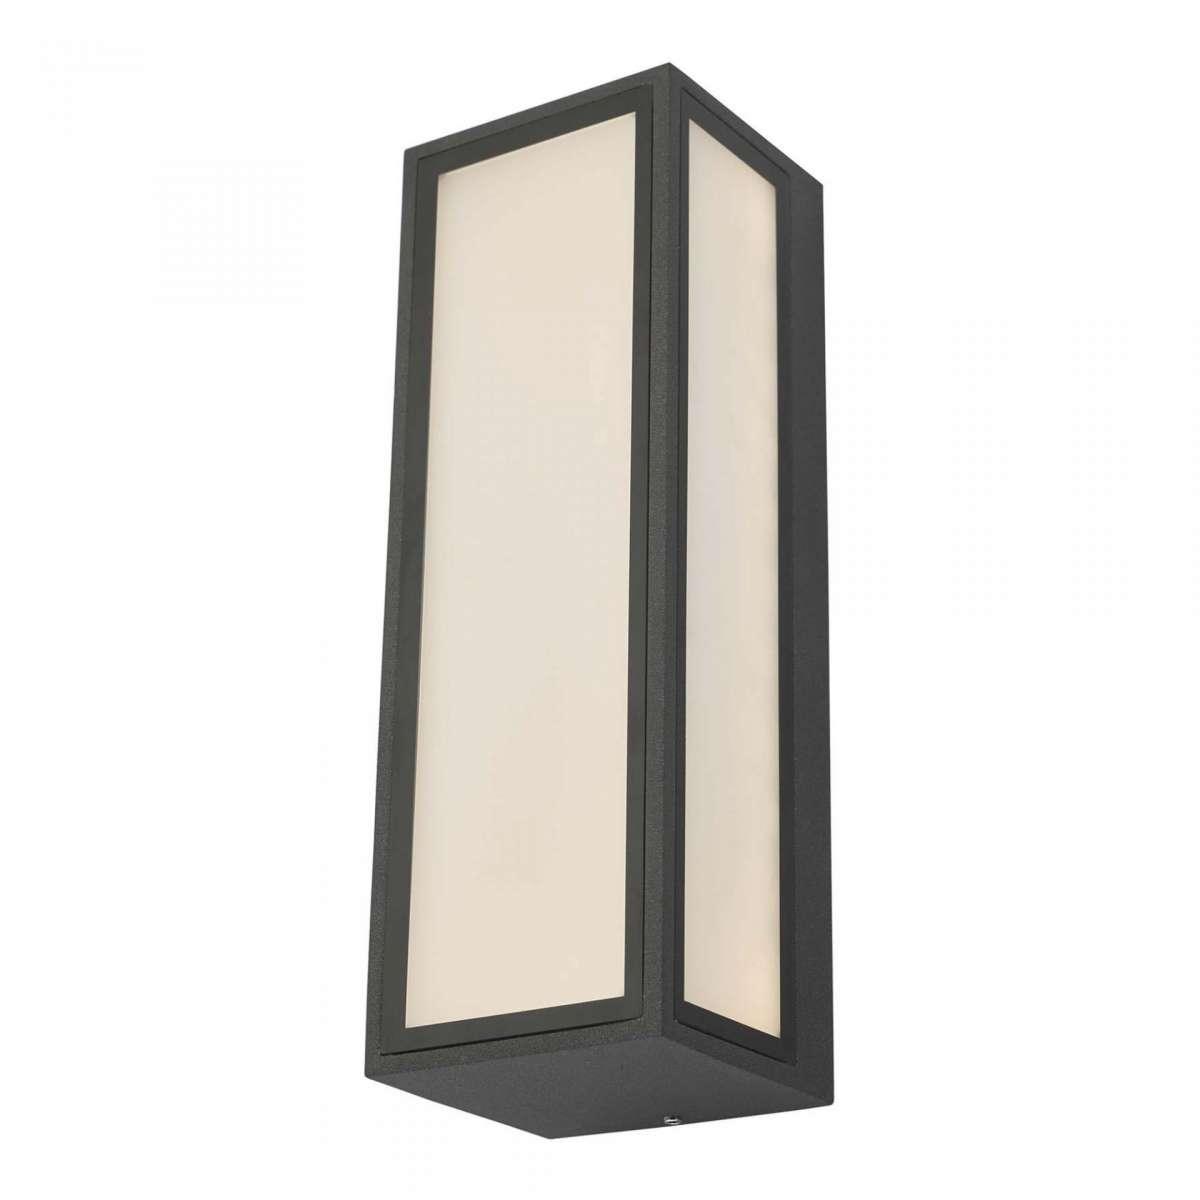 Arham 1 Light Wall Light Anthracite IP65 LED